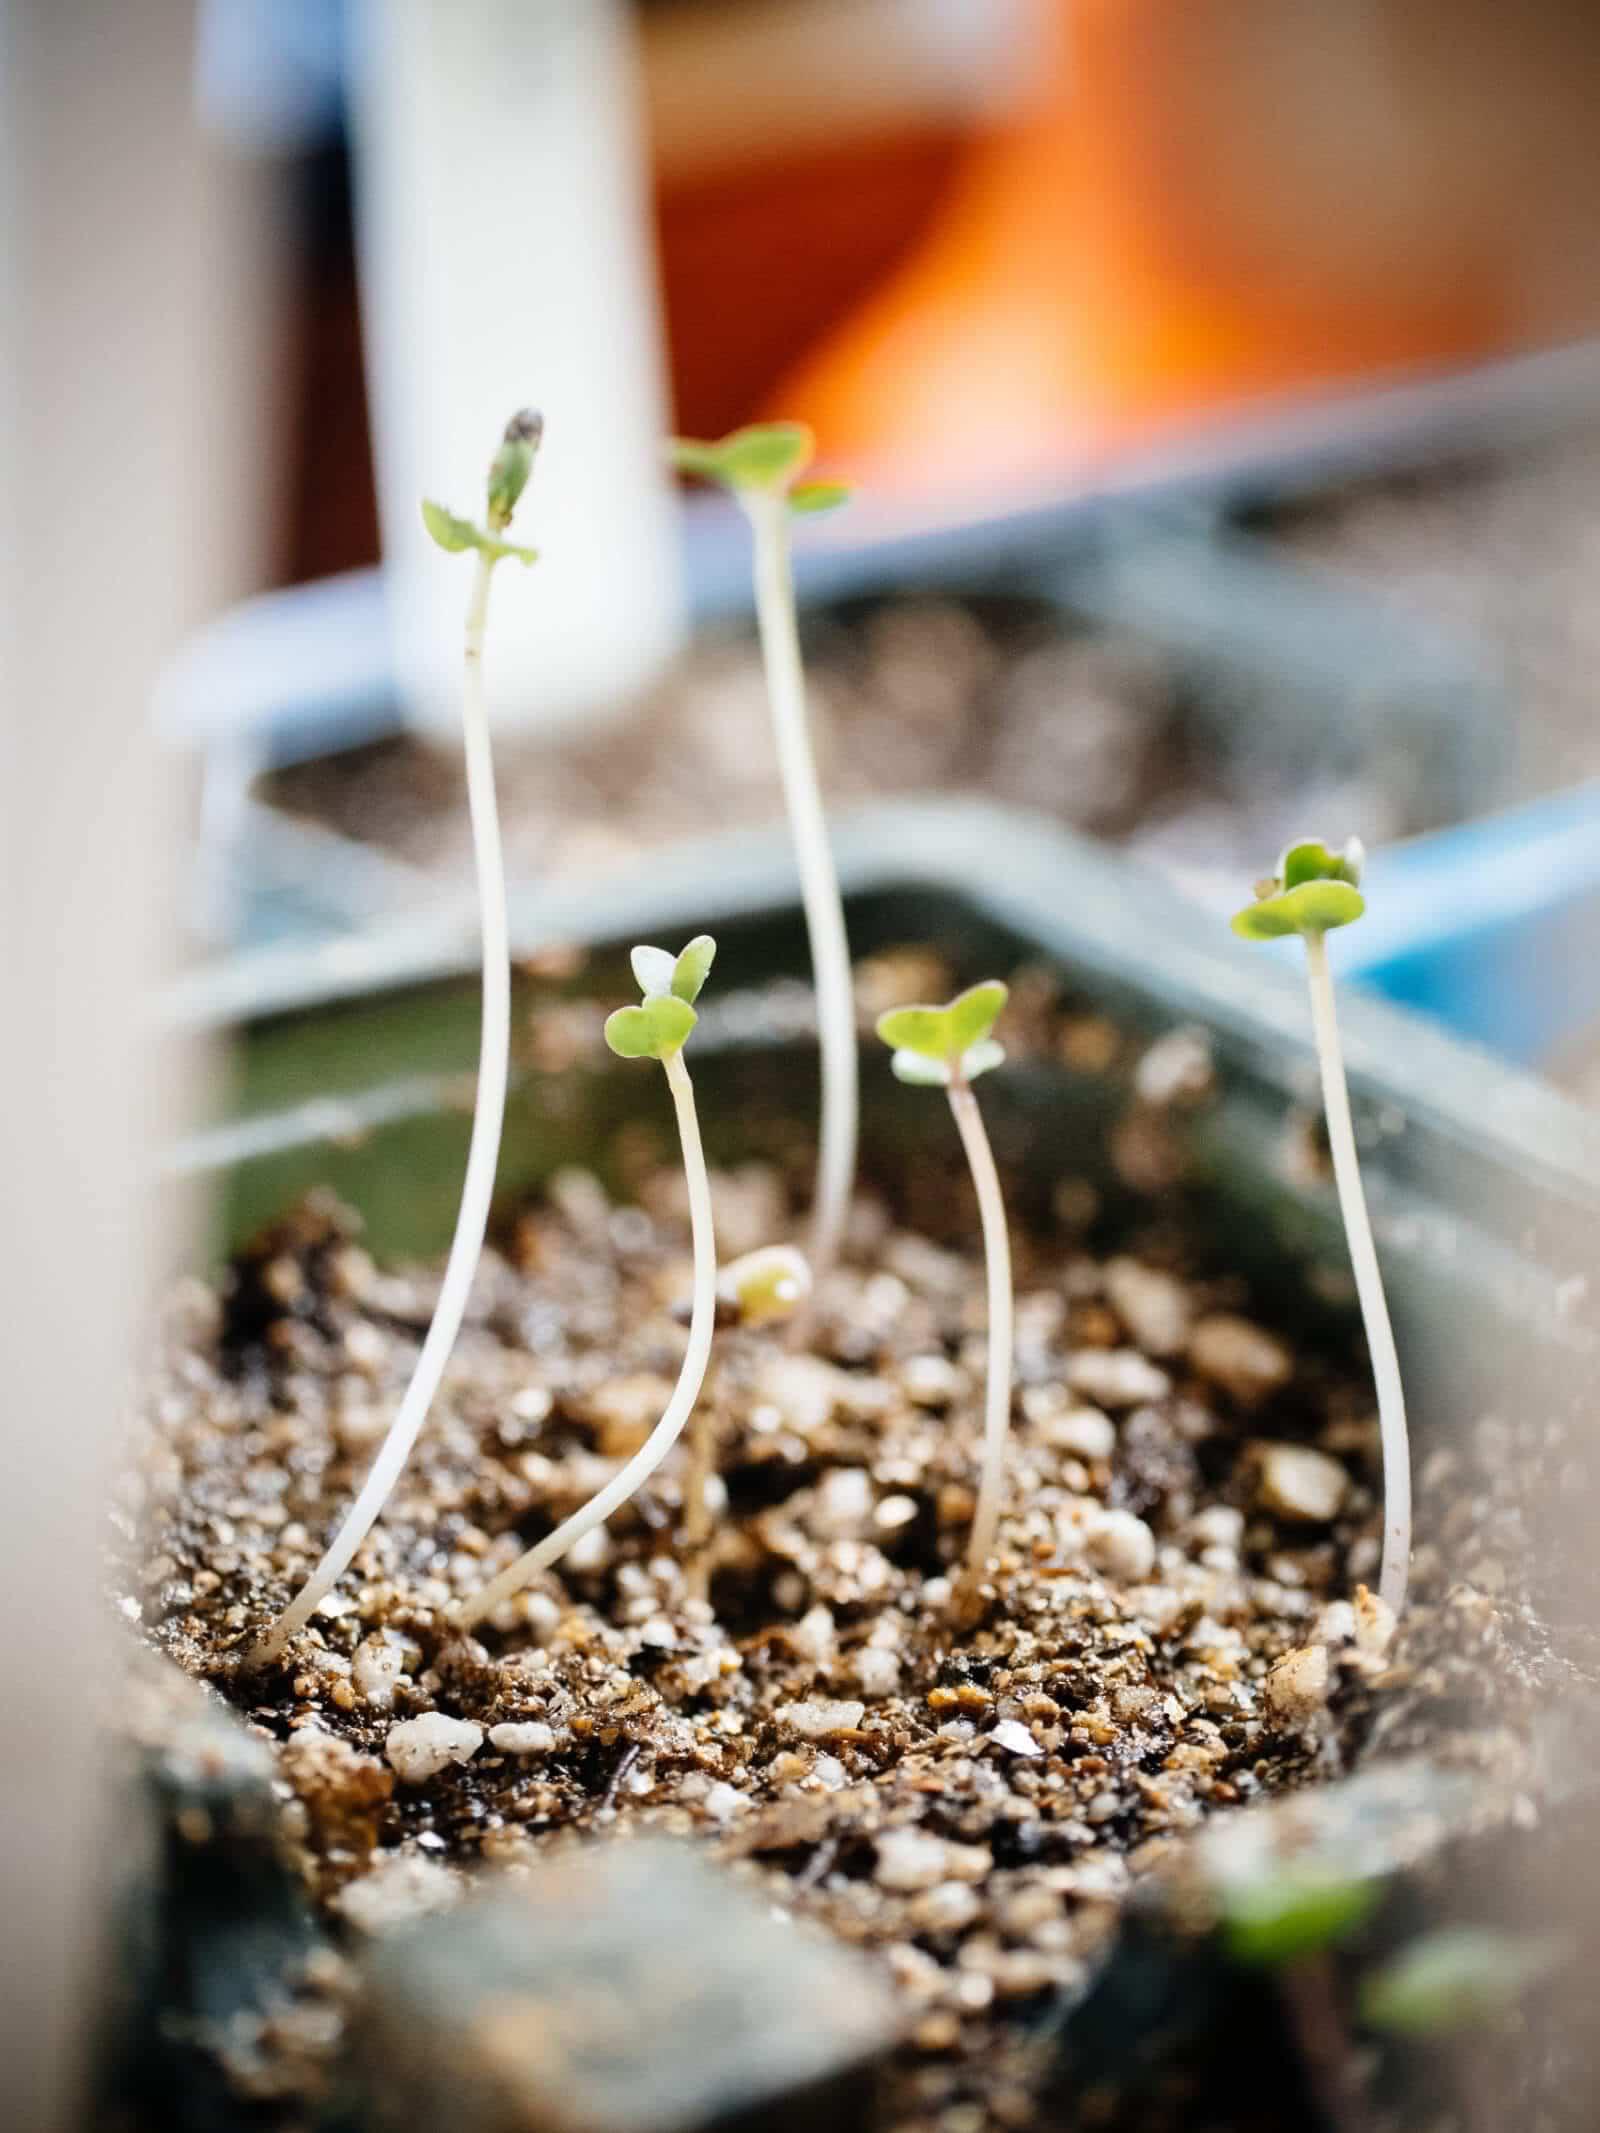 Seeds started indoors